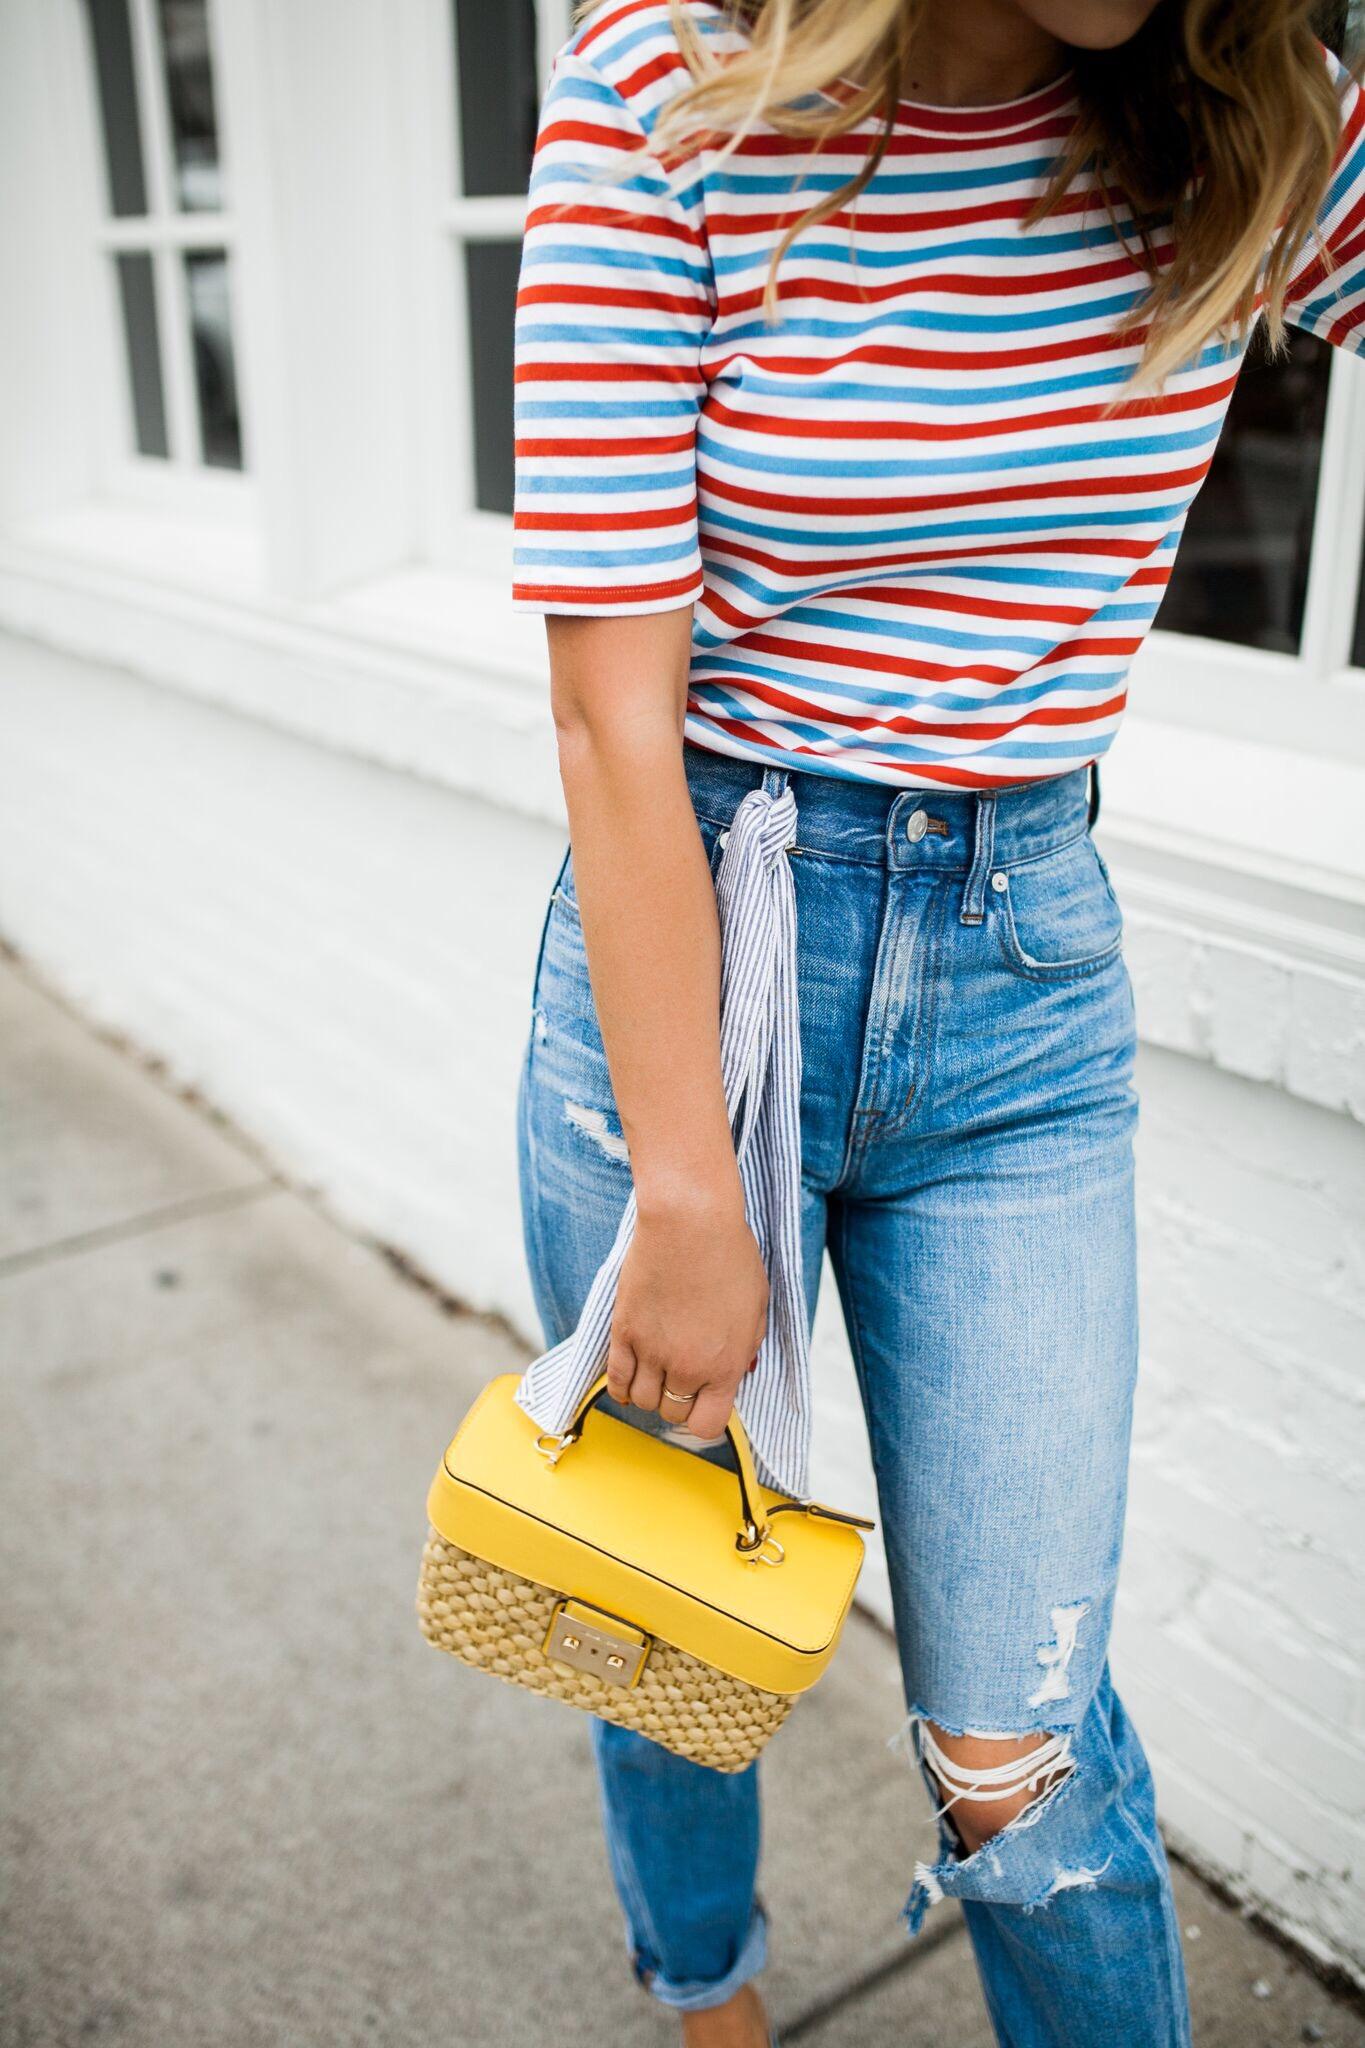 michael-kors-straw-yellow-bag.JPG